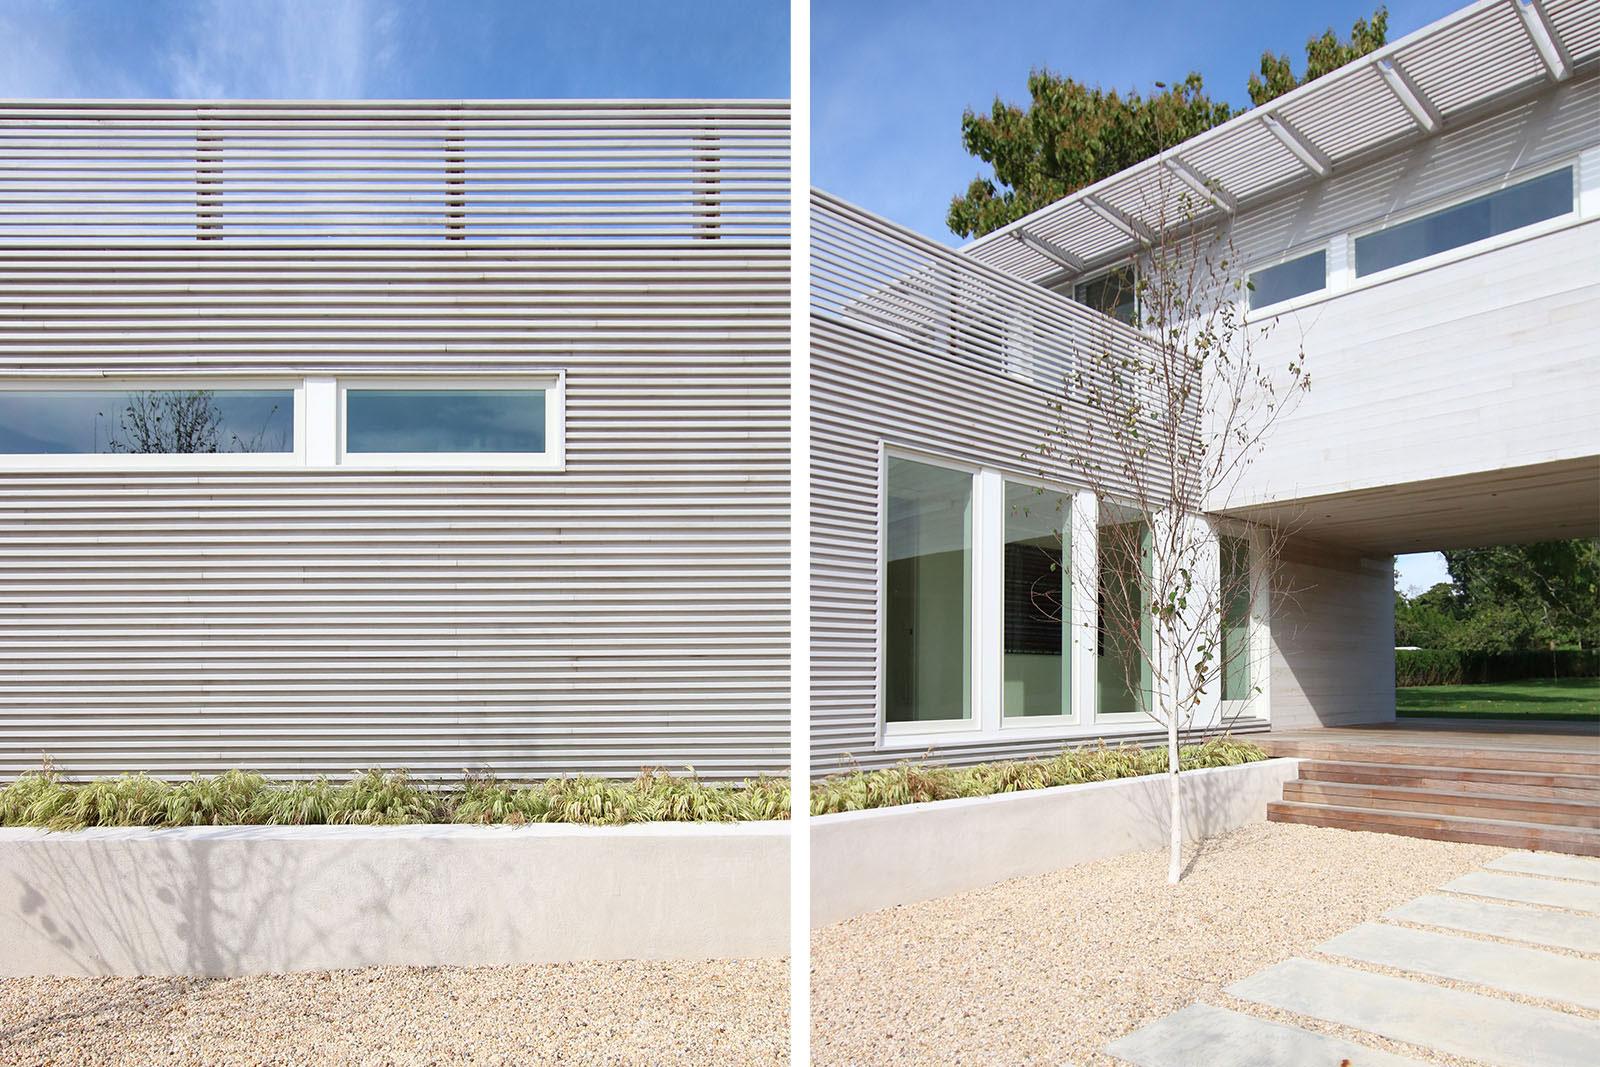 5-re4a-resolution-4-architecture-modern-modular-prefab-bridgehampton house-exterior.jpg